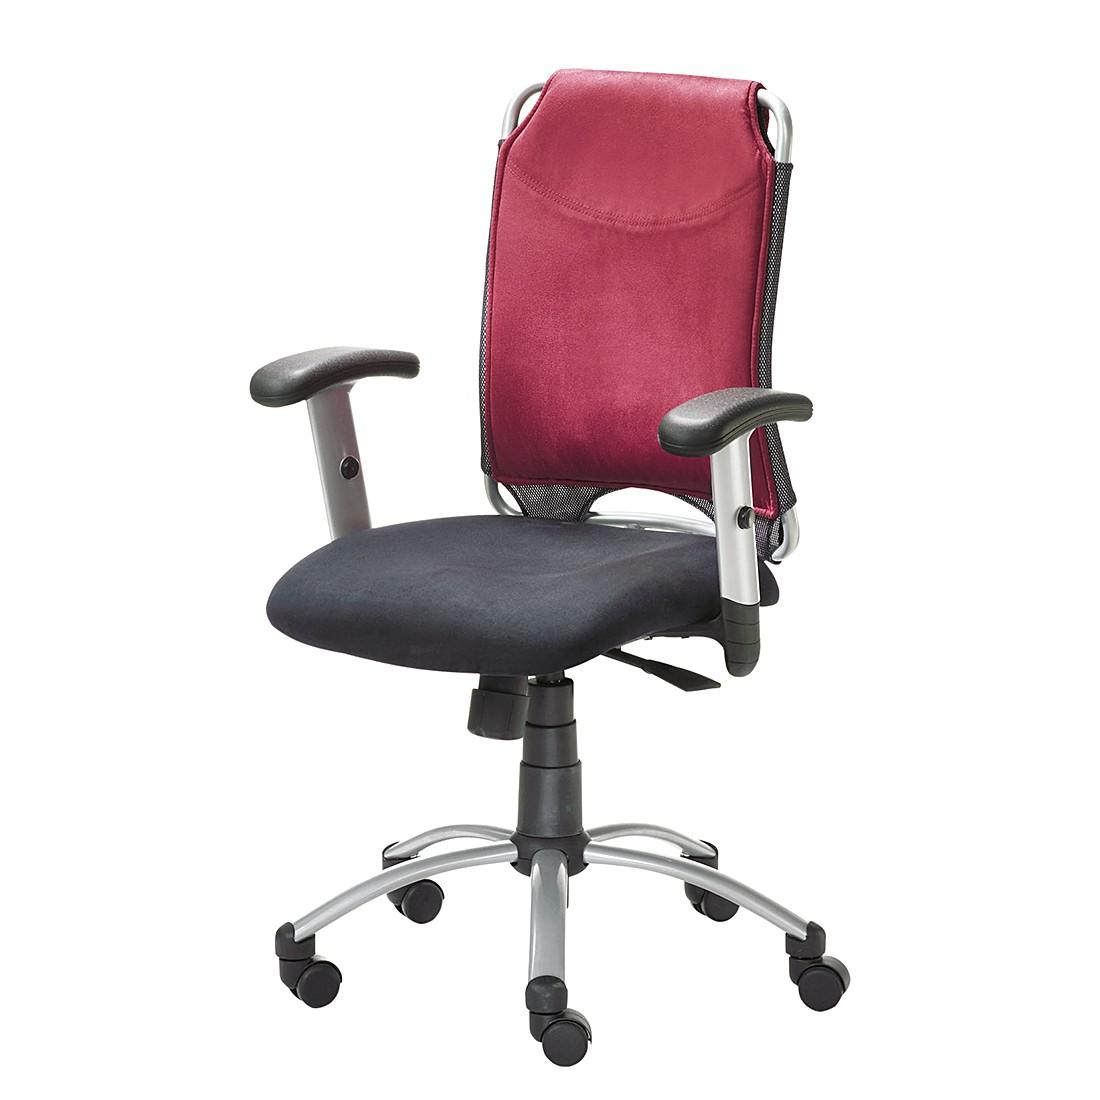 Bürodrehstuhl Sparkle – Rot, home24office günstig bestellen